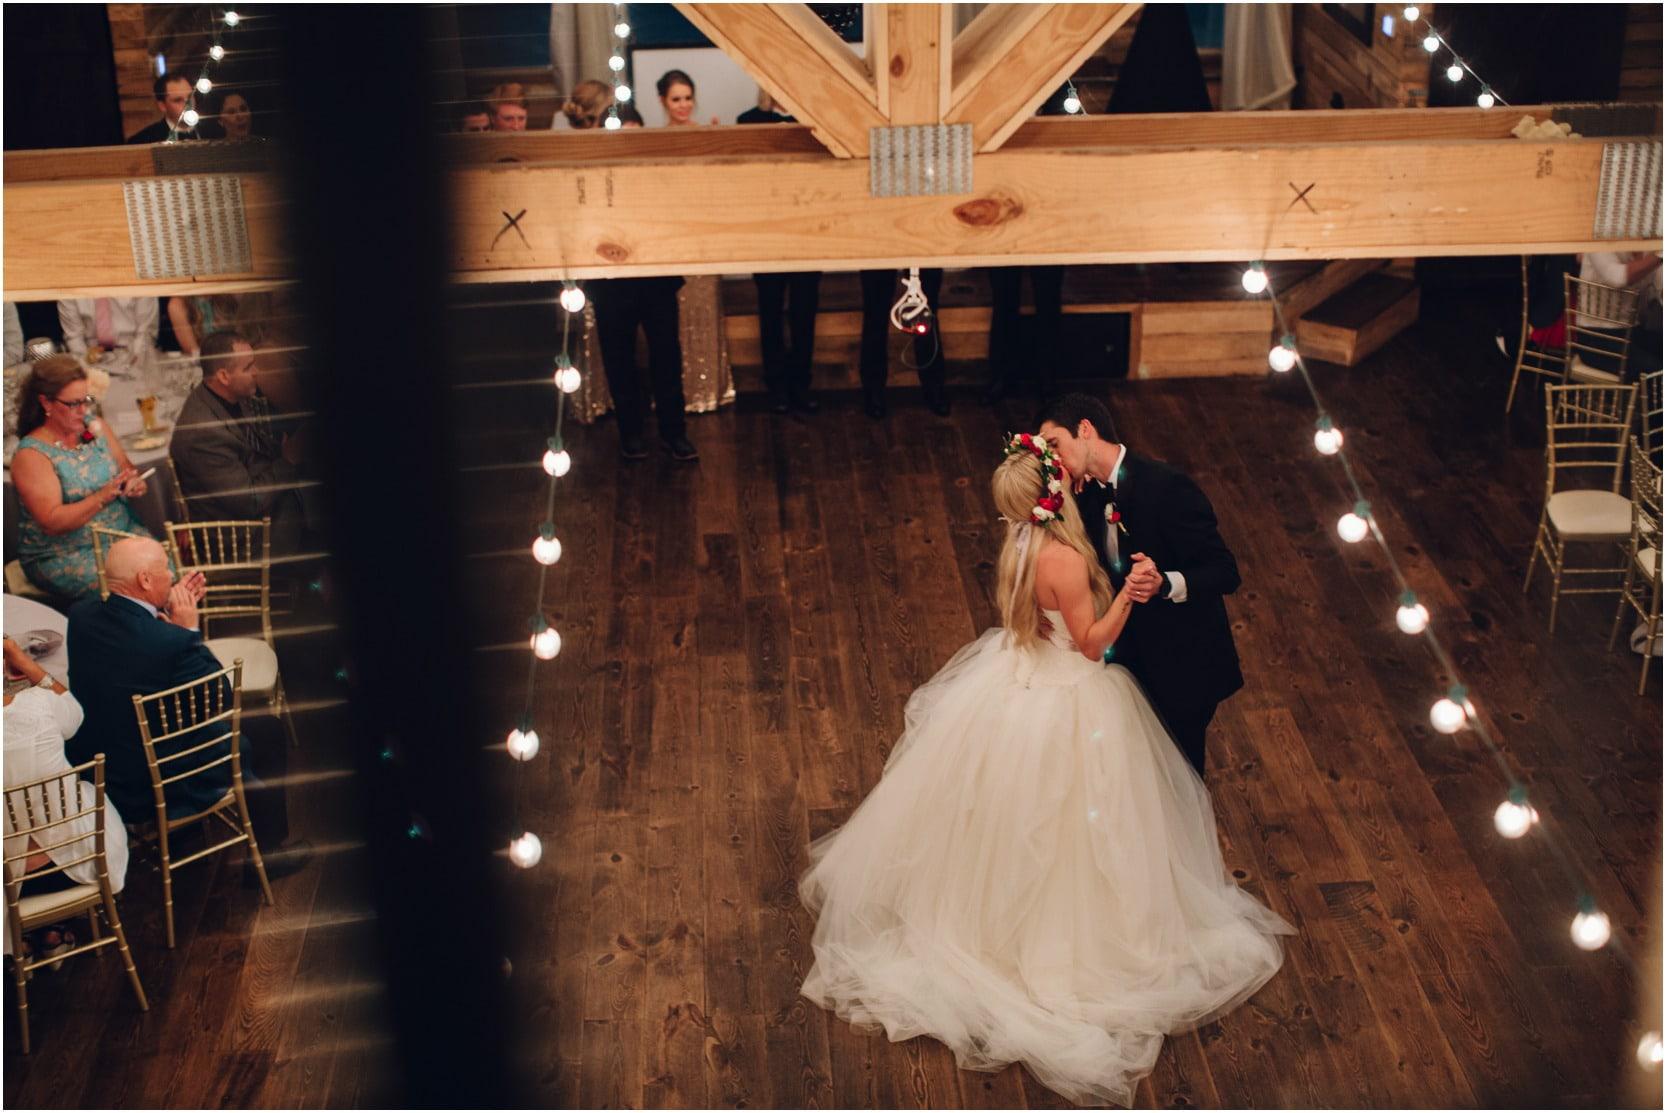 coderhillengburg_oklahoma_wedding__814_blogstomped